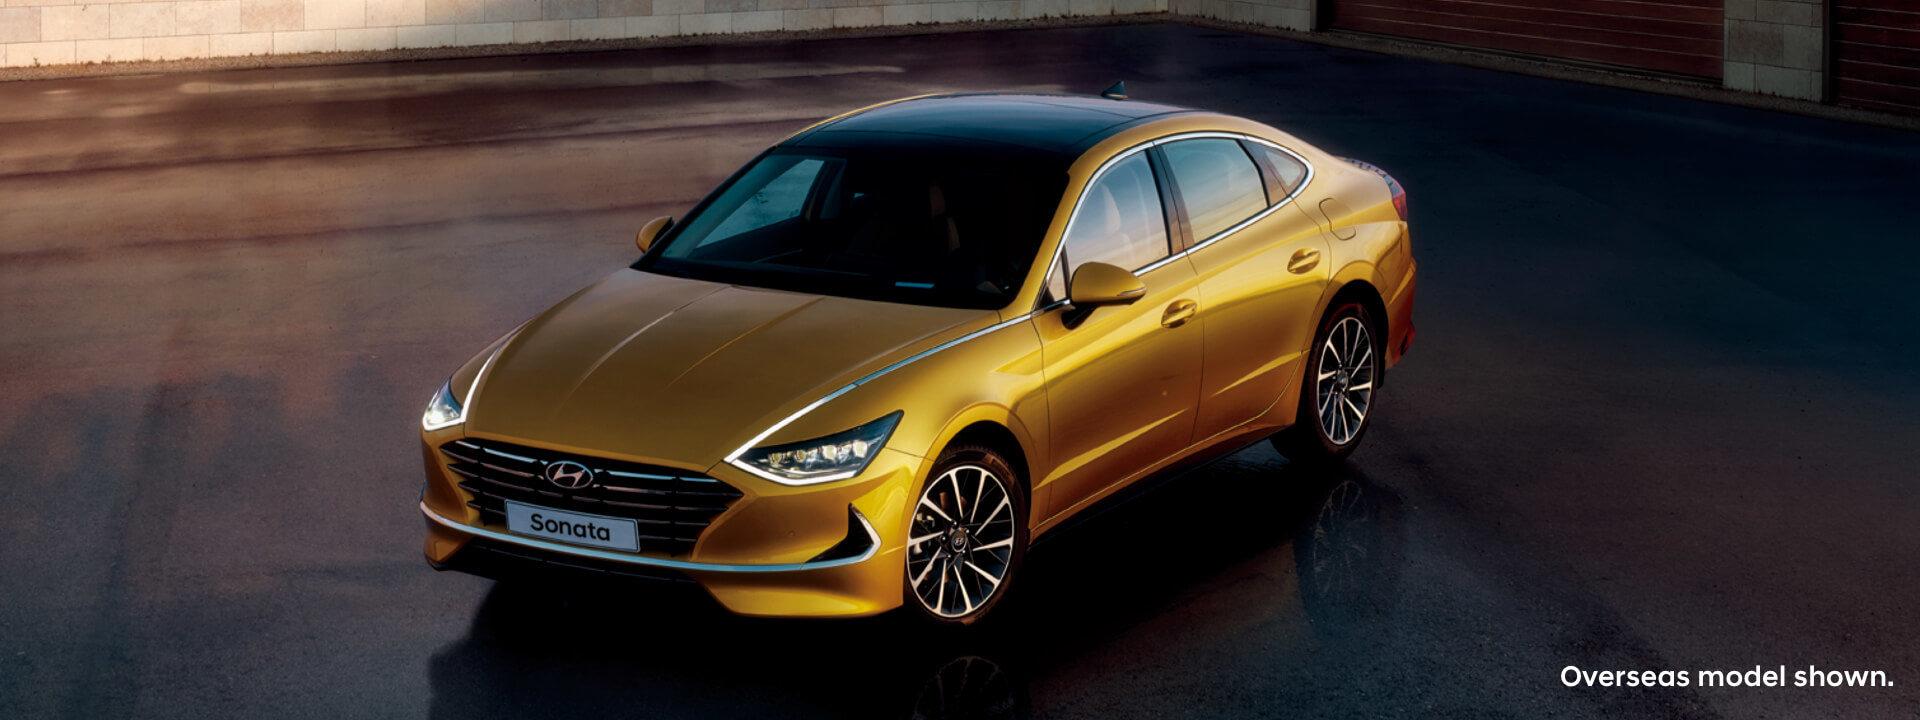 Hyundai_Sonata_Exterior_Hotspot_1920x720